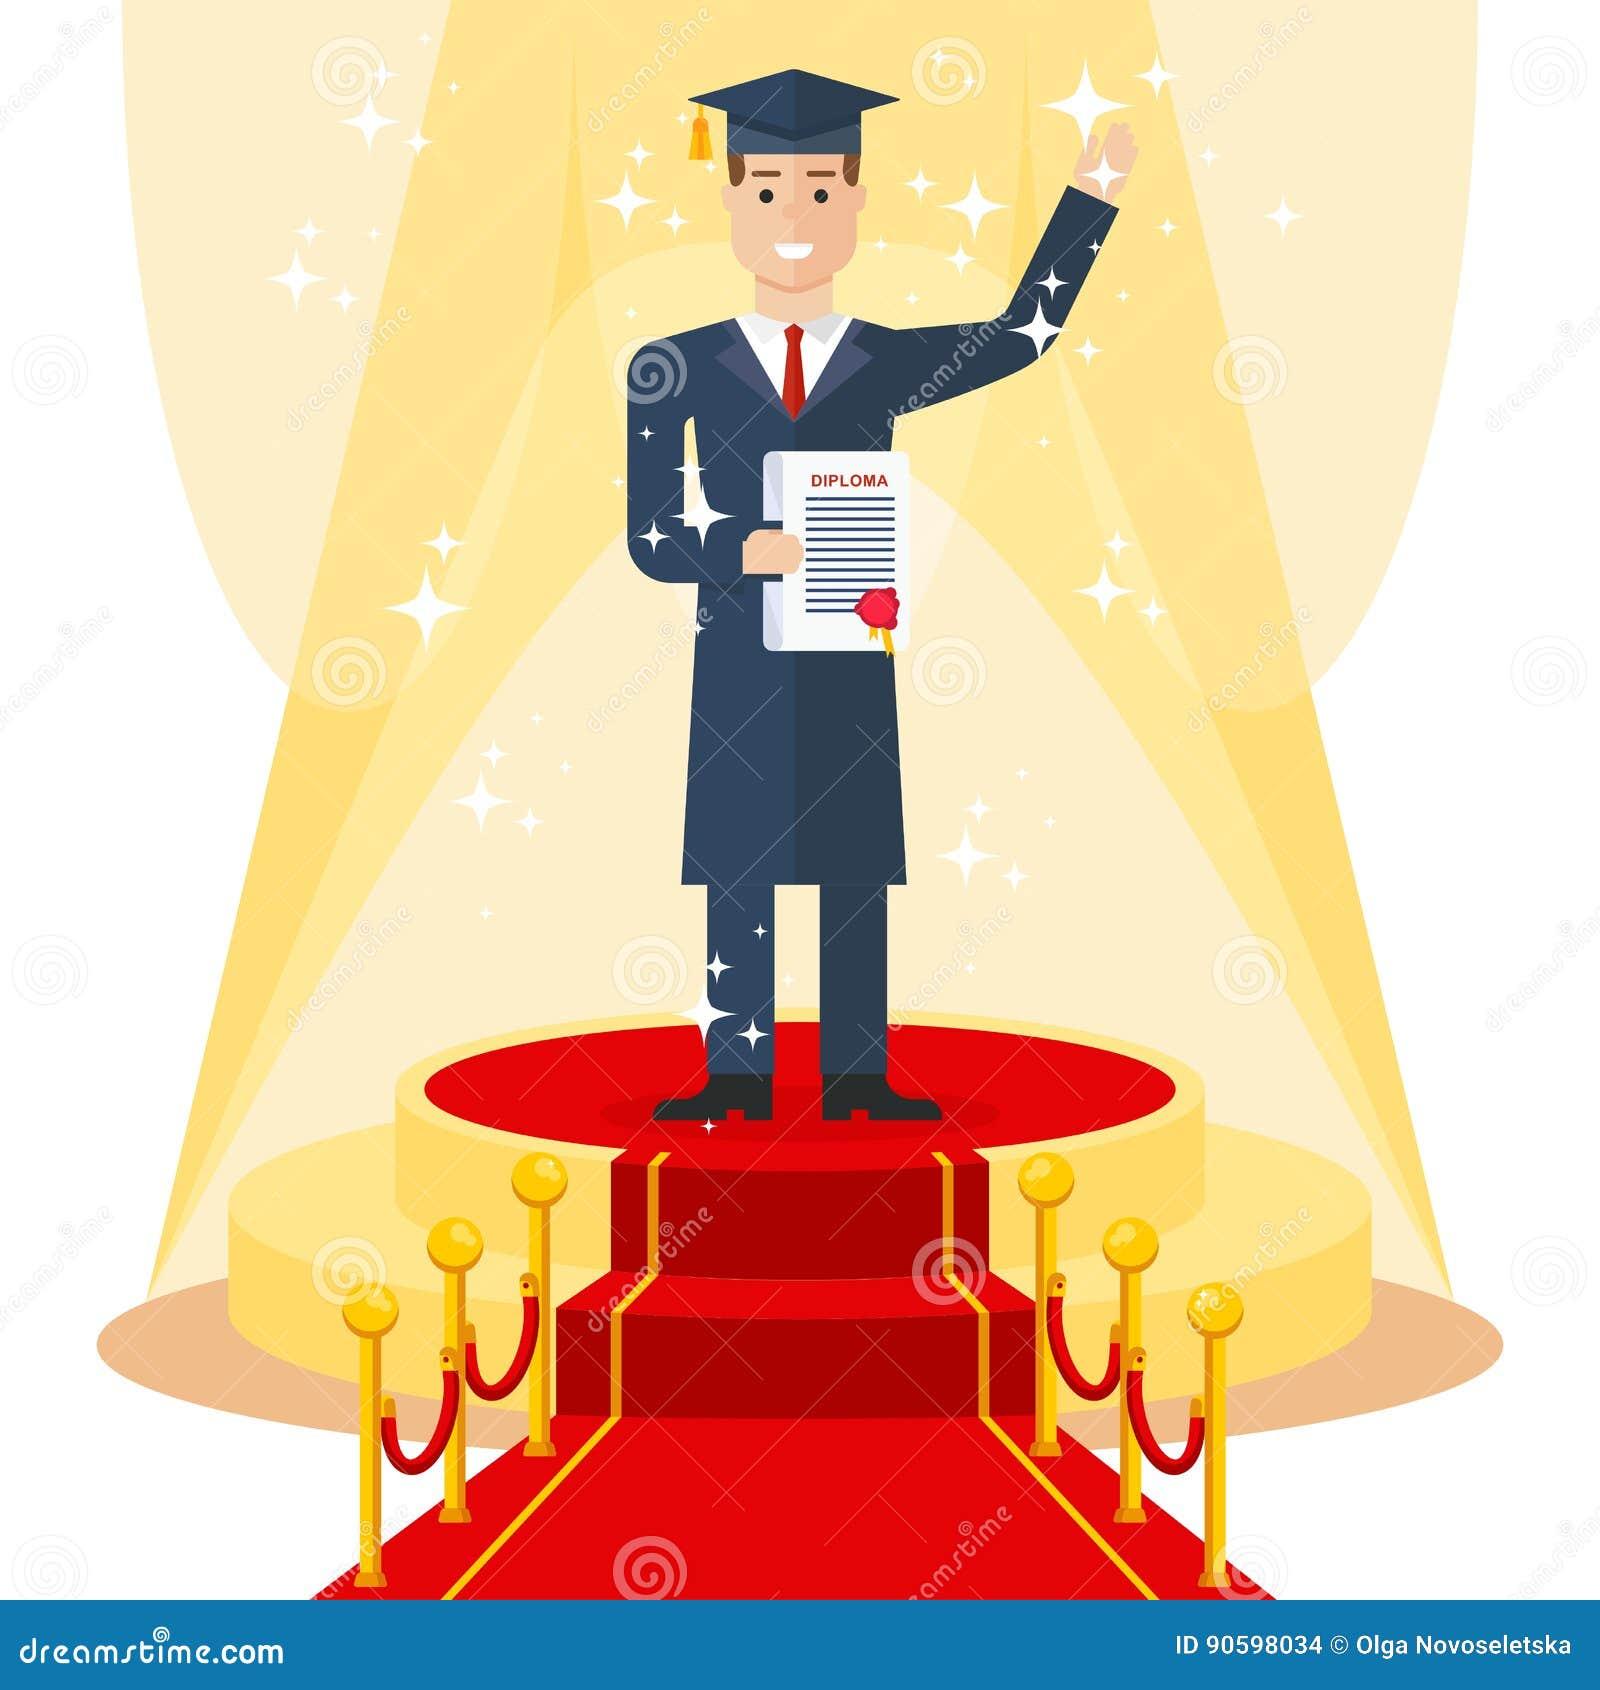 student on red carpet stock vector. illustration of light - 90598034